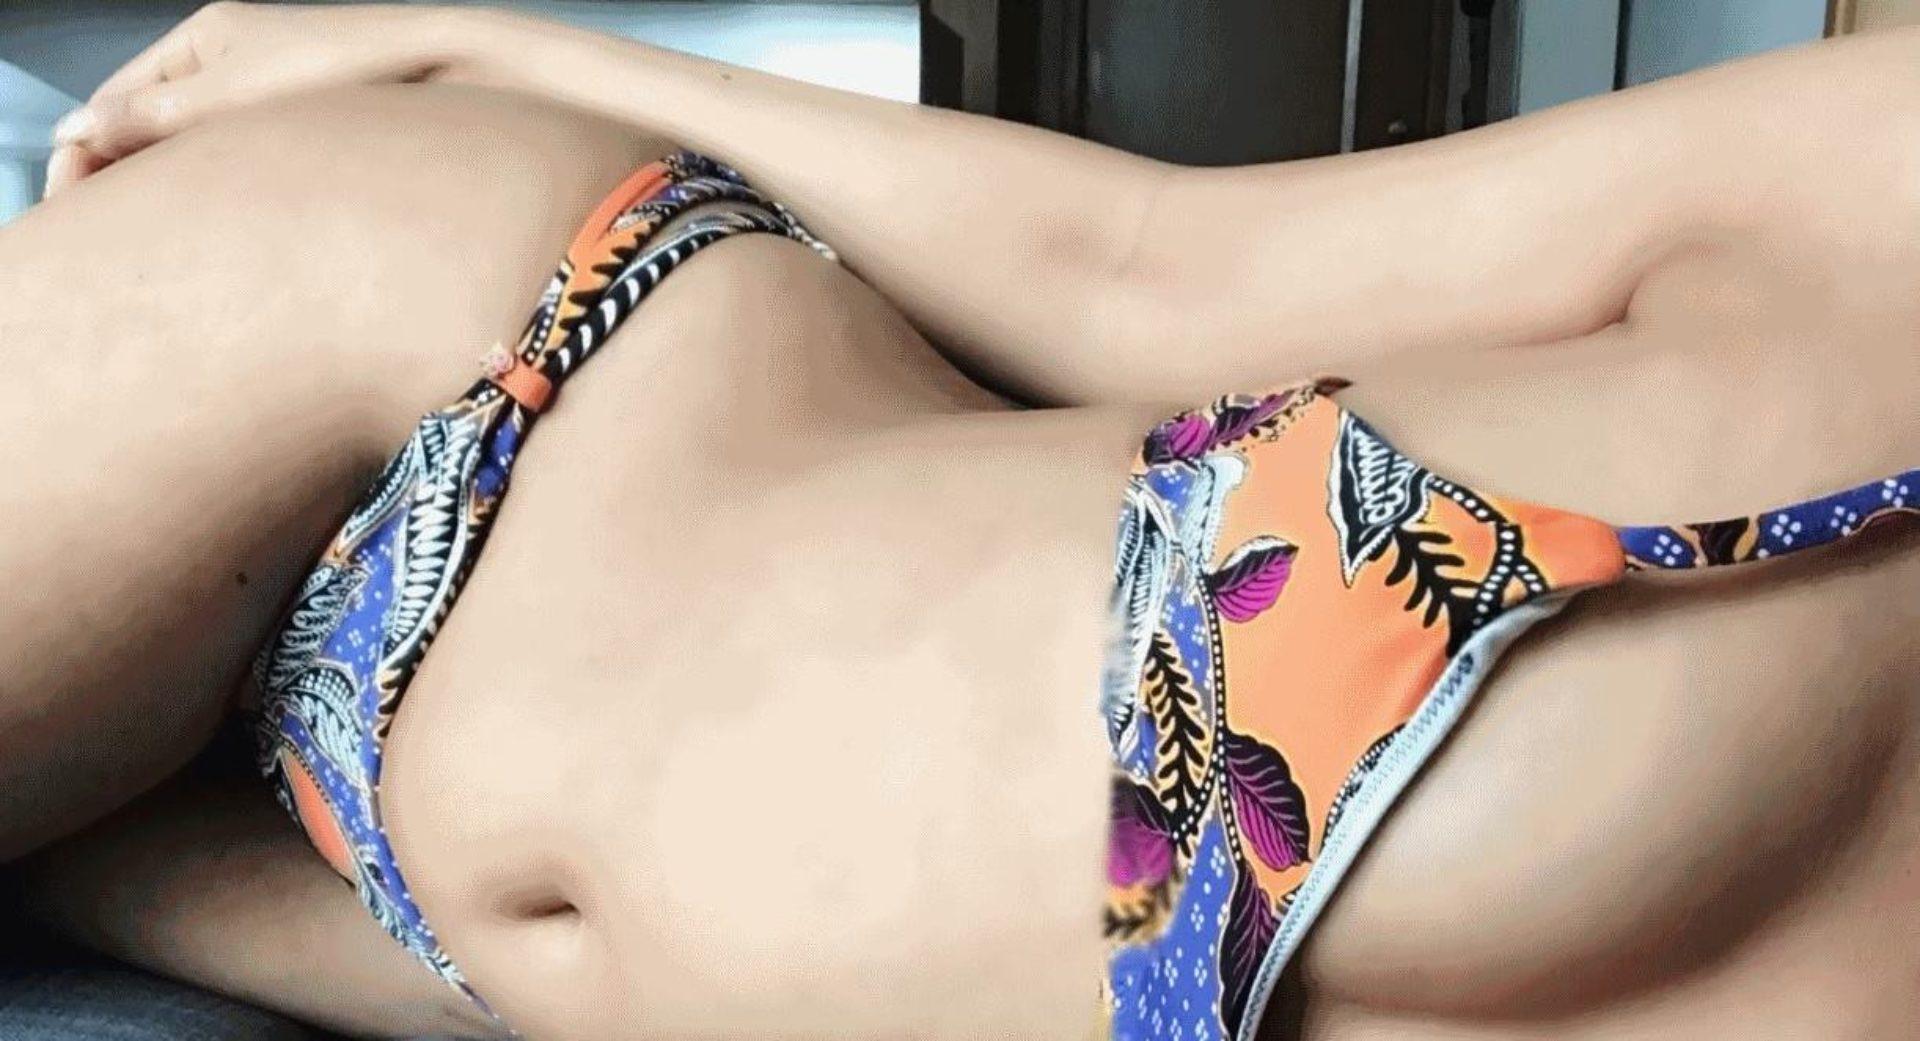 Afina  Sexy playmate